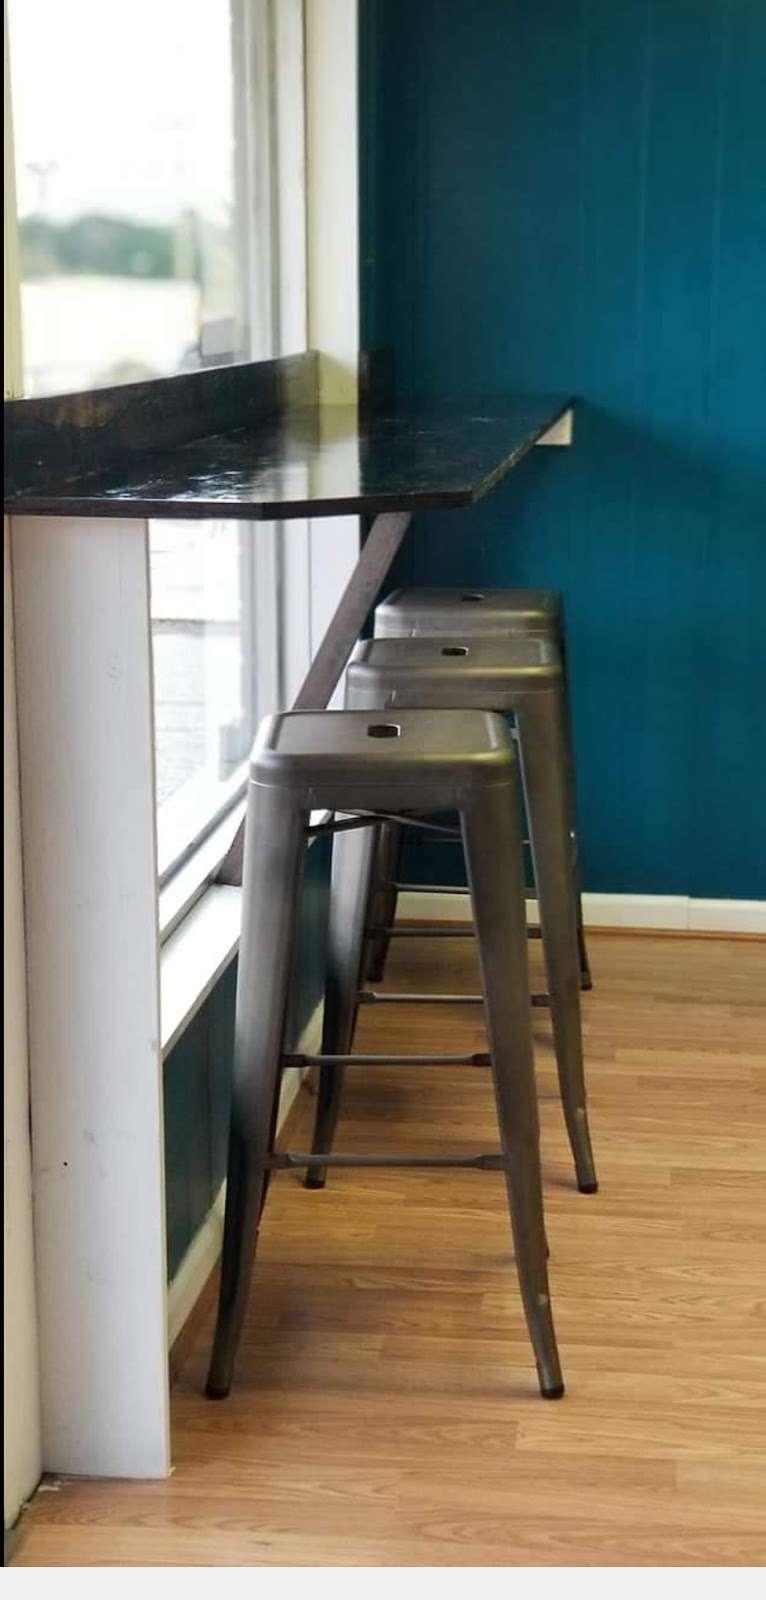 Grounded Coffeehouse - cafe  | Photo 4 of 8 | Address: 2657 E Main St, Lincolnton, NC 28092, USA | Phone: (980) 429-2052